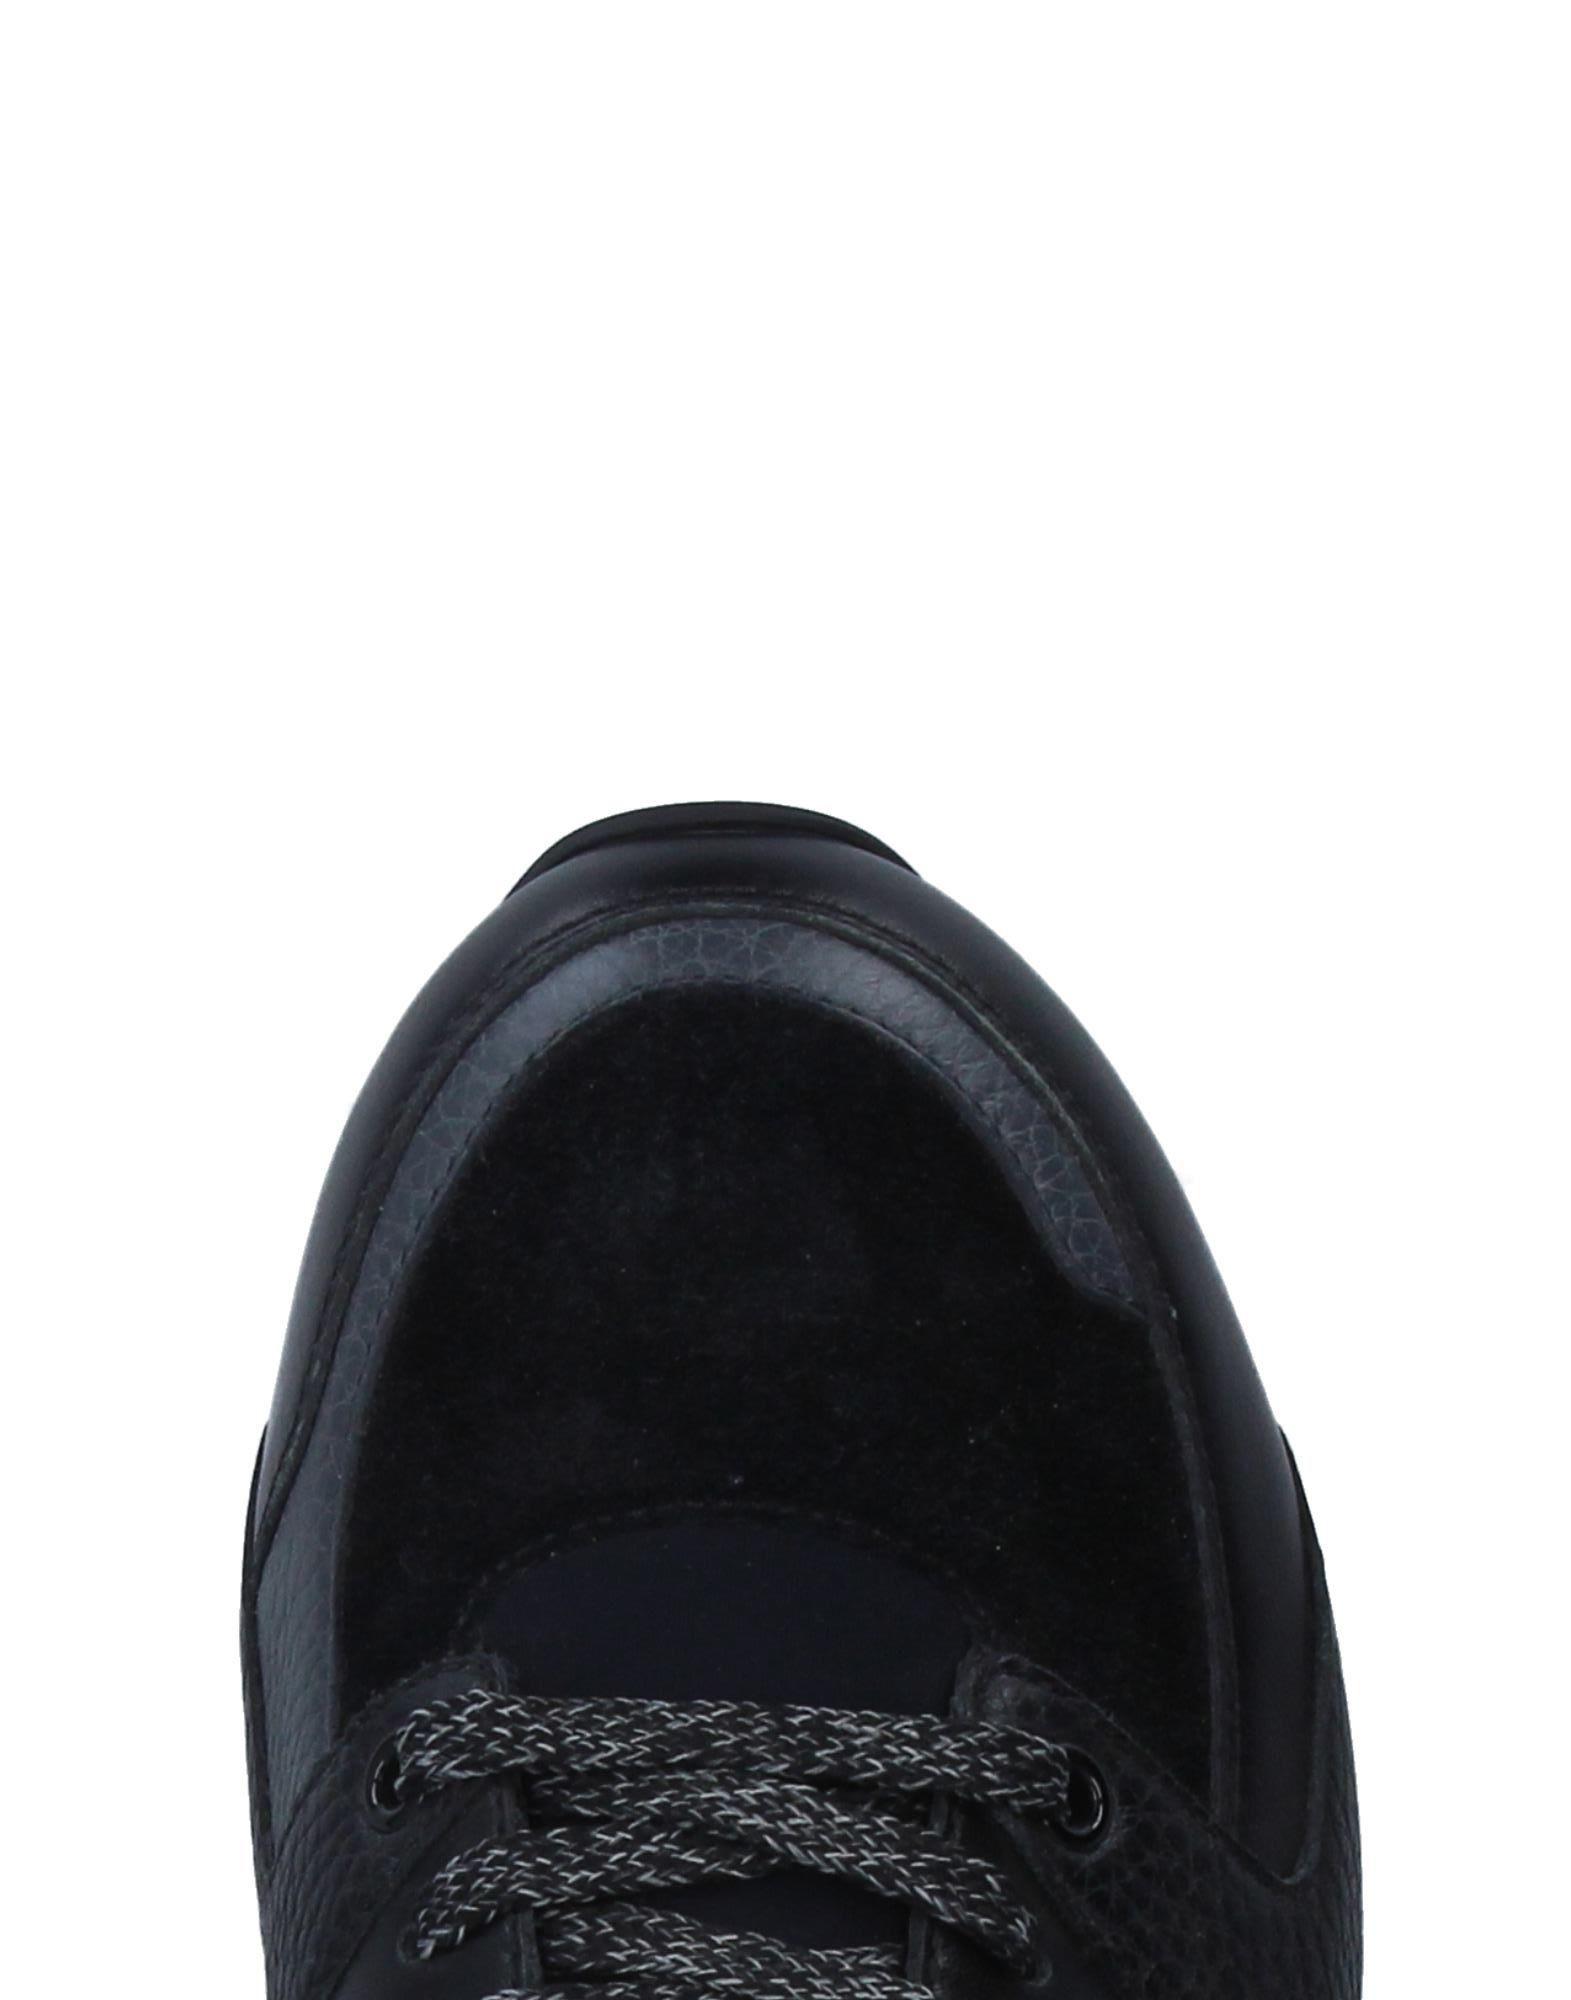 Dolce Herren & Gabbana Sneakers Herren Dolce  11315152SE 974b47